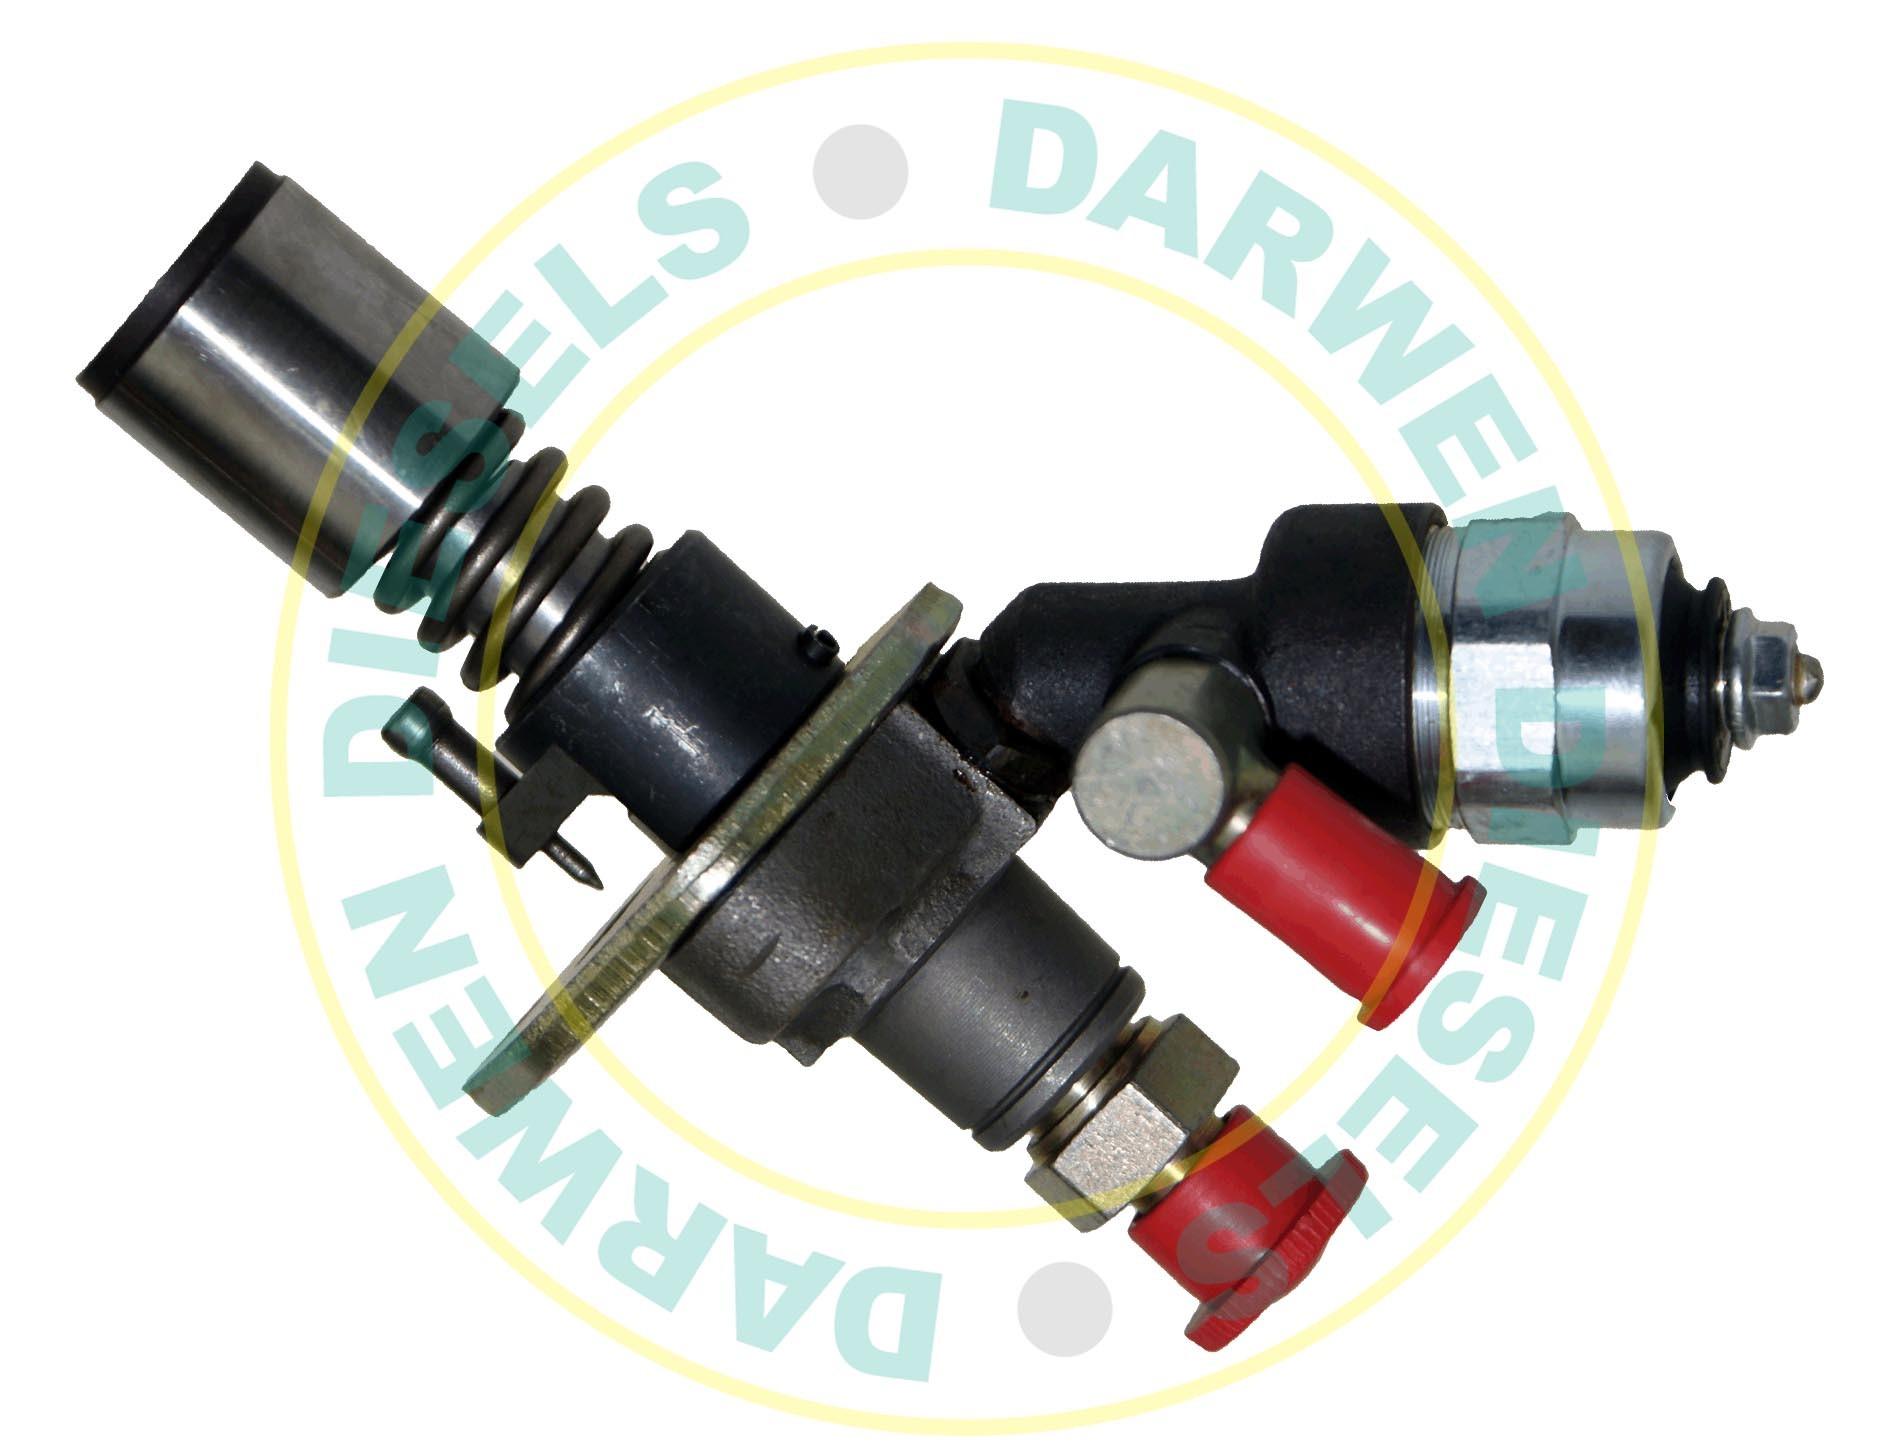 714350 51710 non genuine yanmar fuel pump with solenoid darwen 714350 51710 non genuine yanmar fuel pump with solenoid darwen diesels ltd ccuart Gallery